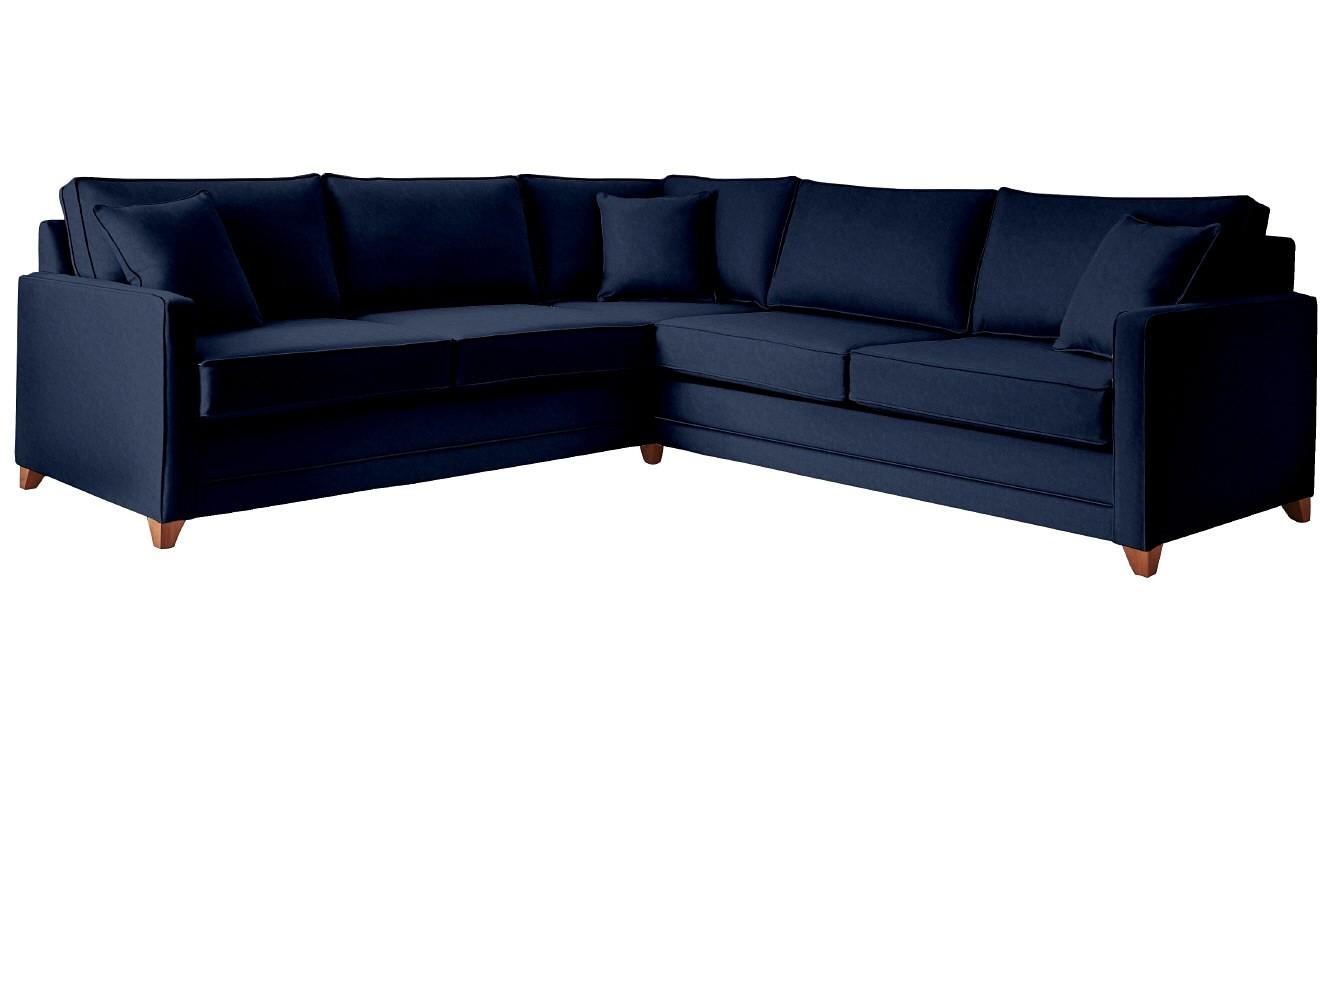 The Restrop 7 Seater Corner Sofa Bed